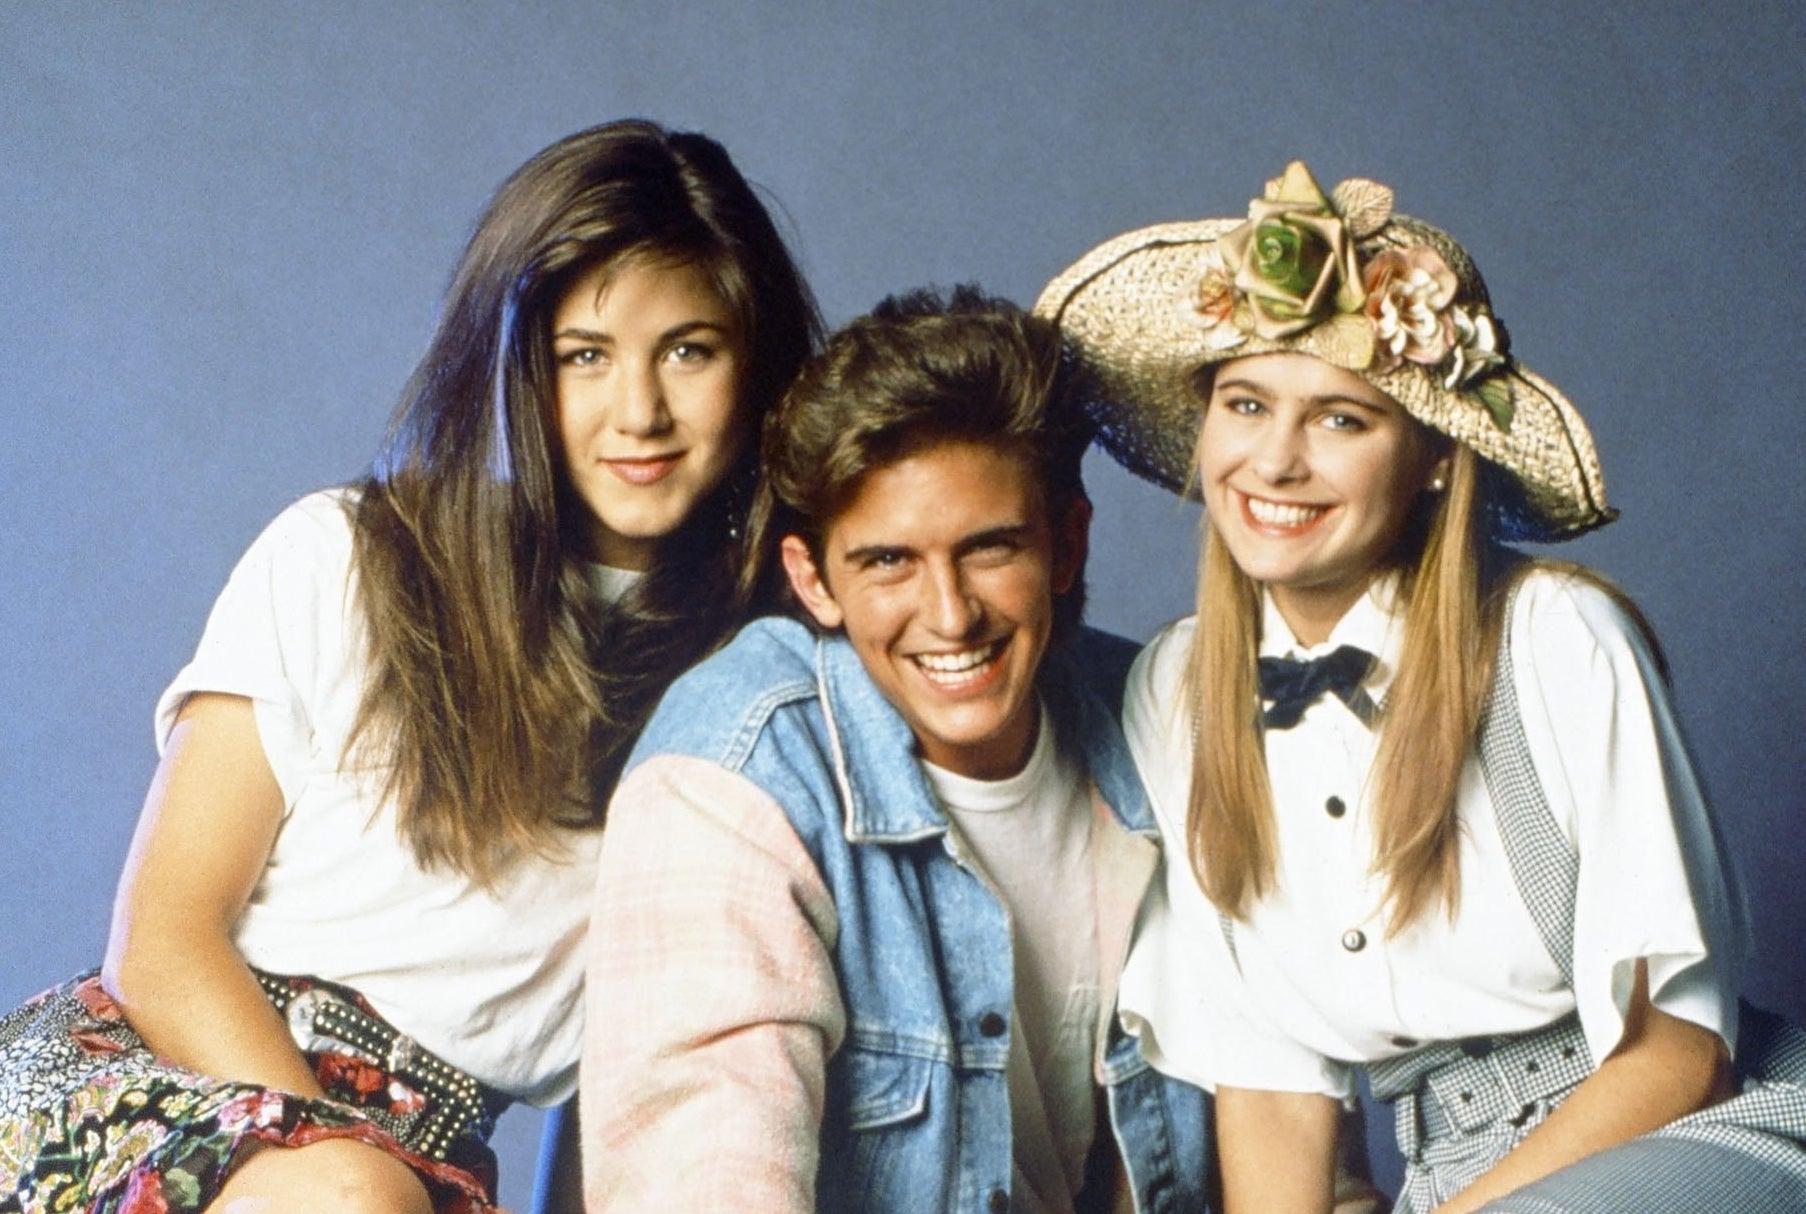 Jennifer Aniston as Jeannie Bueller, Charlie Schlatter as Ferris Bueller, Ami Dolenz as Sloan Peterson sitting on a white limo